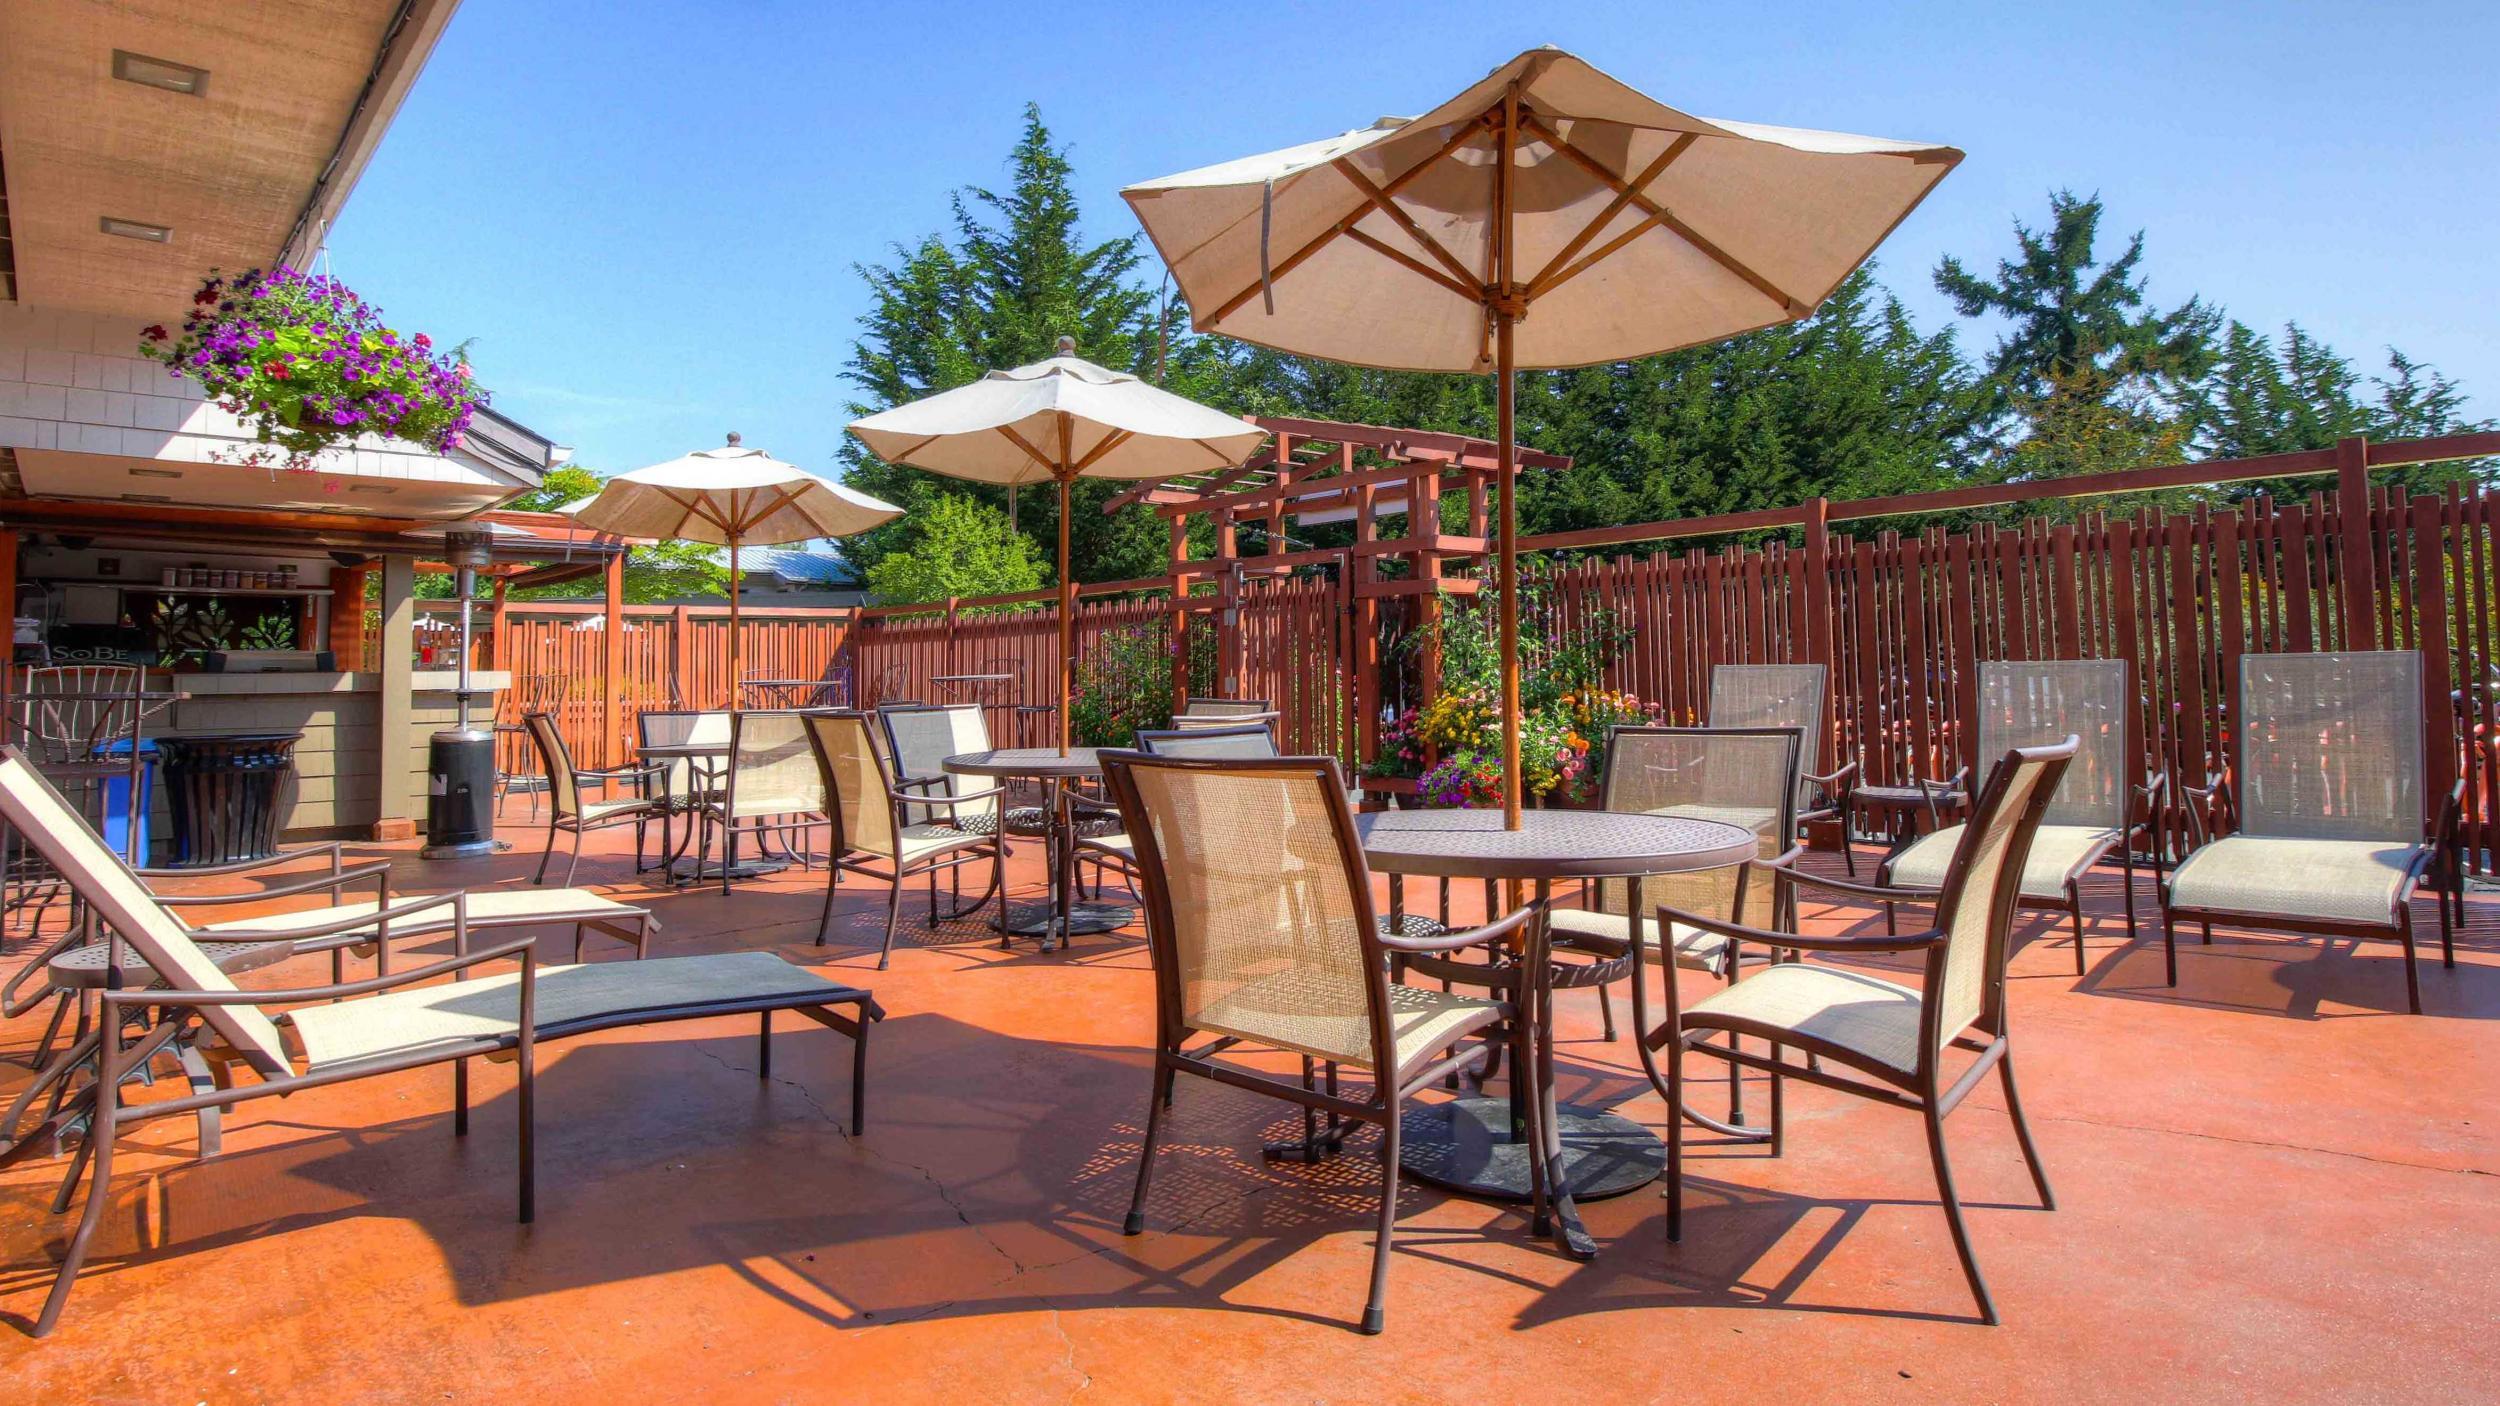 Our Coffee Bar Friday Harbor Hotels Earthbox Inn & Spa